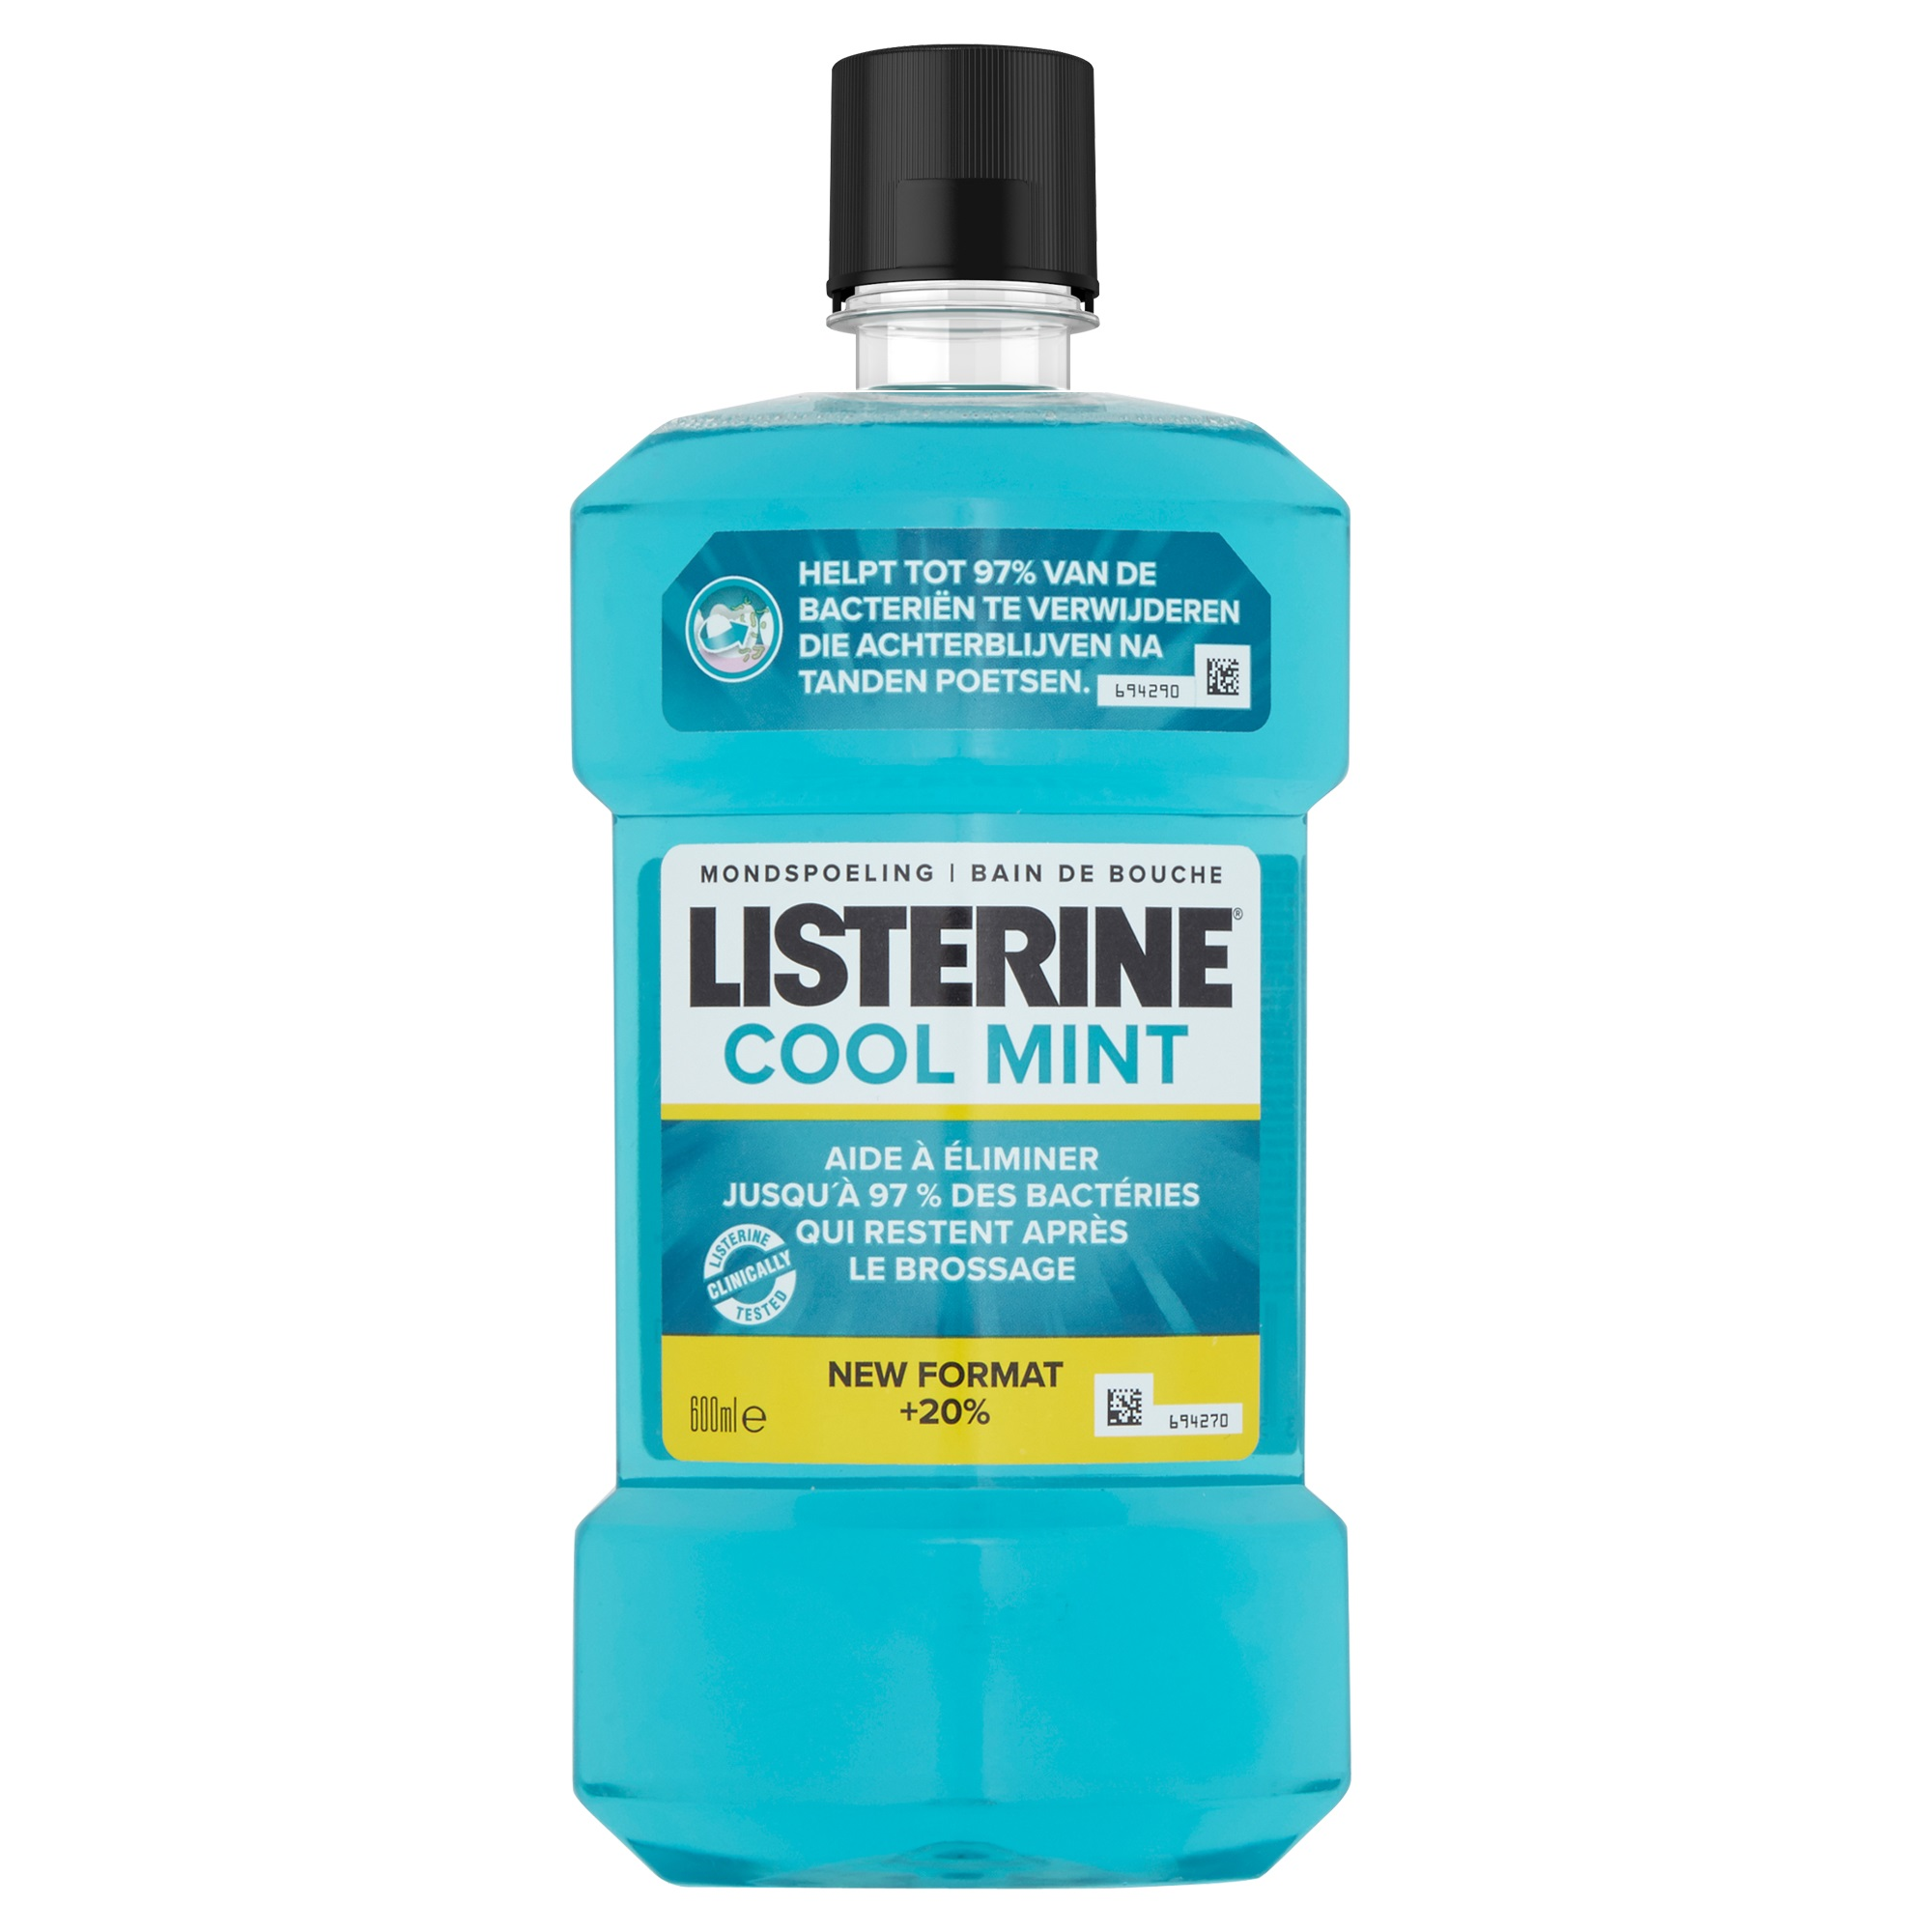 Image of Listerine Coolmint